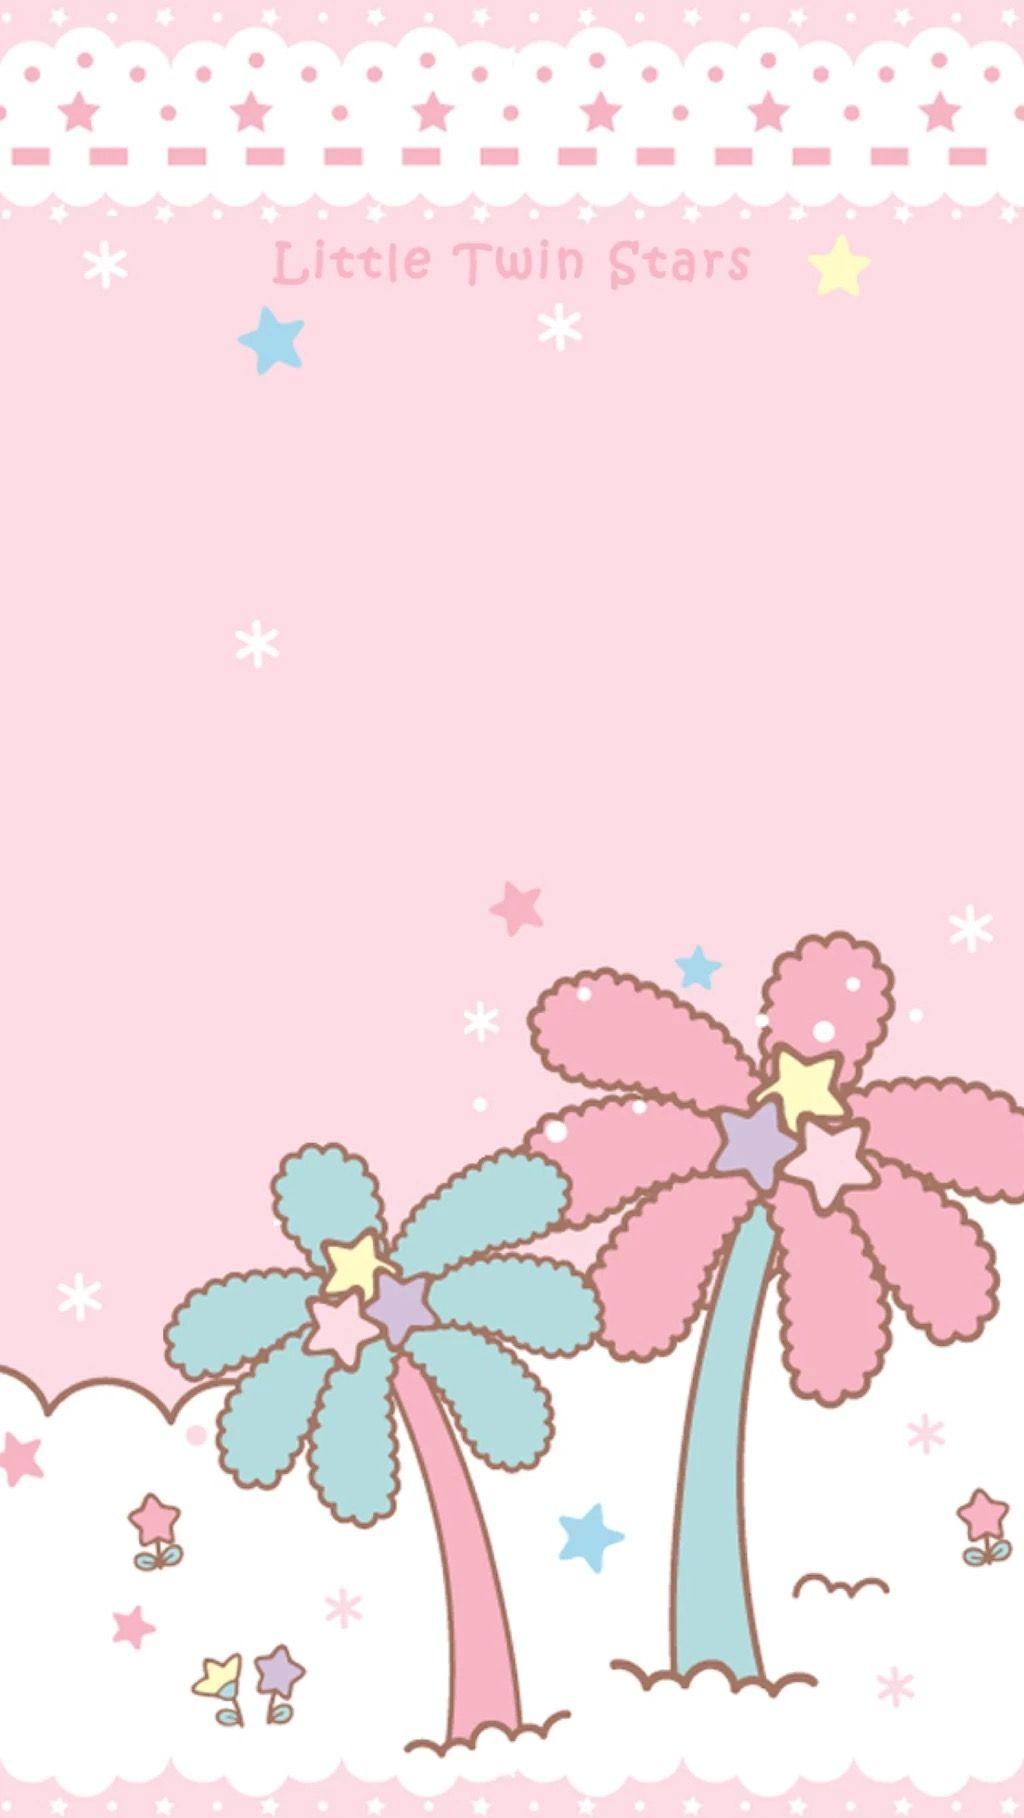 Good Wallpaper Hello Kitty Glitter - 28e55621cd5c4ac5c4fd06a1dd2fab27  Pictures_761183.jpg